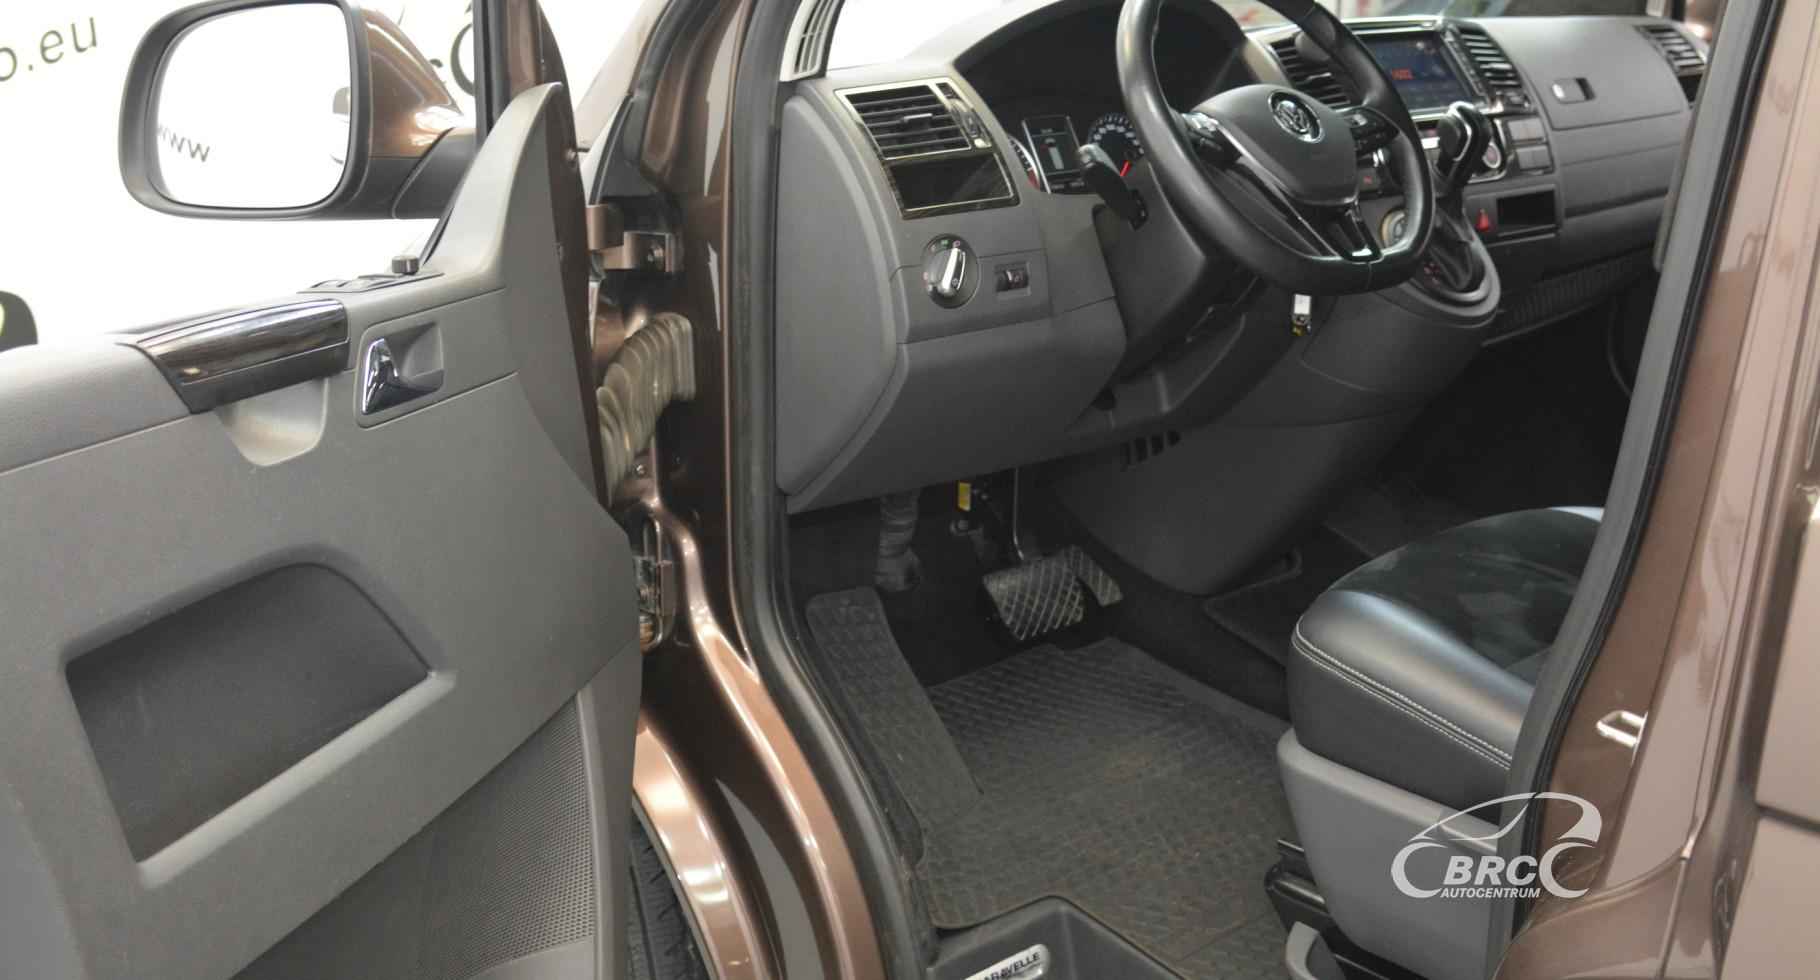 Volkswagen Caravelle 2.0 TDI 4Motion Automatas